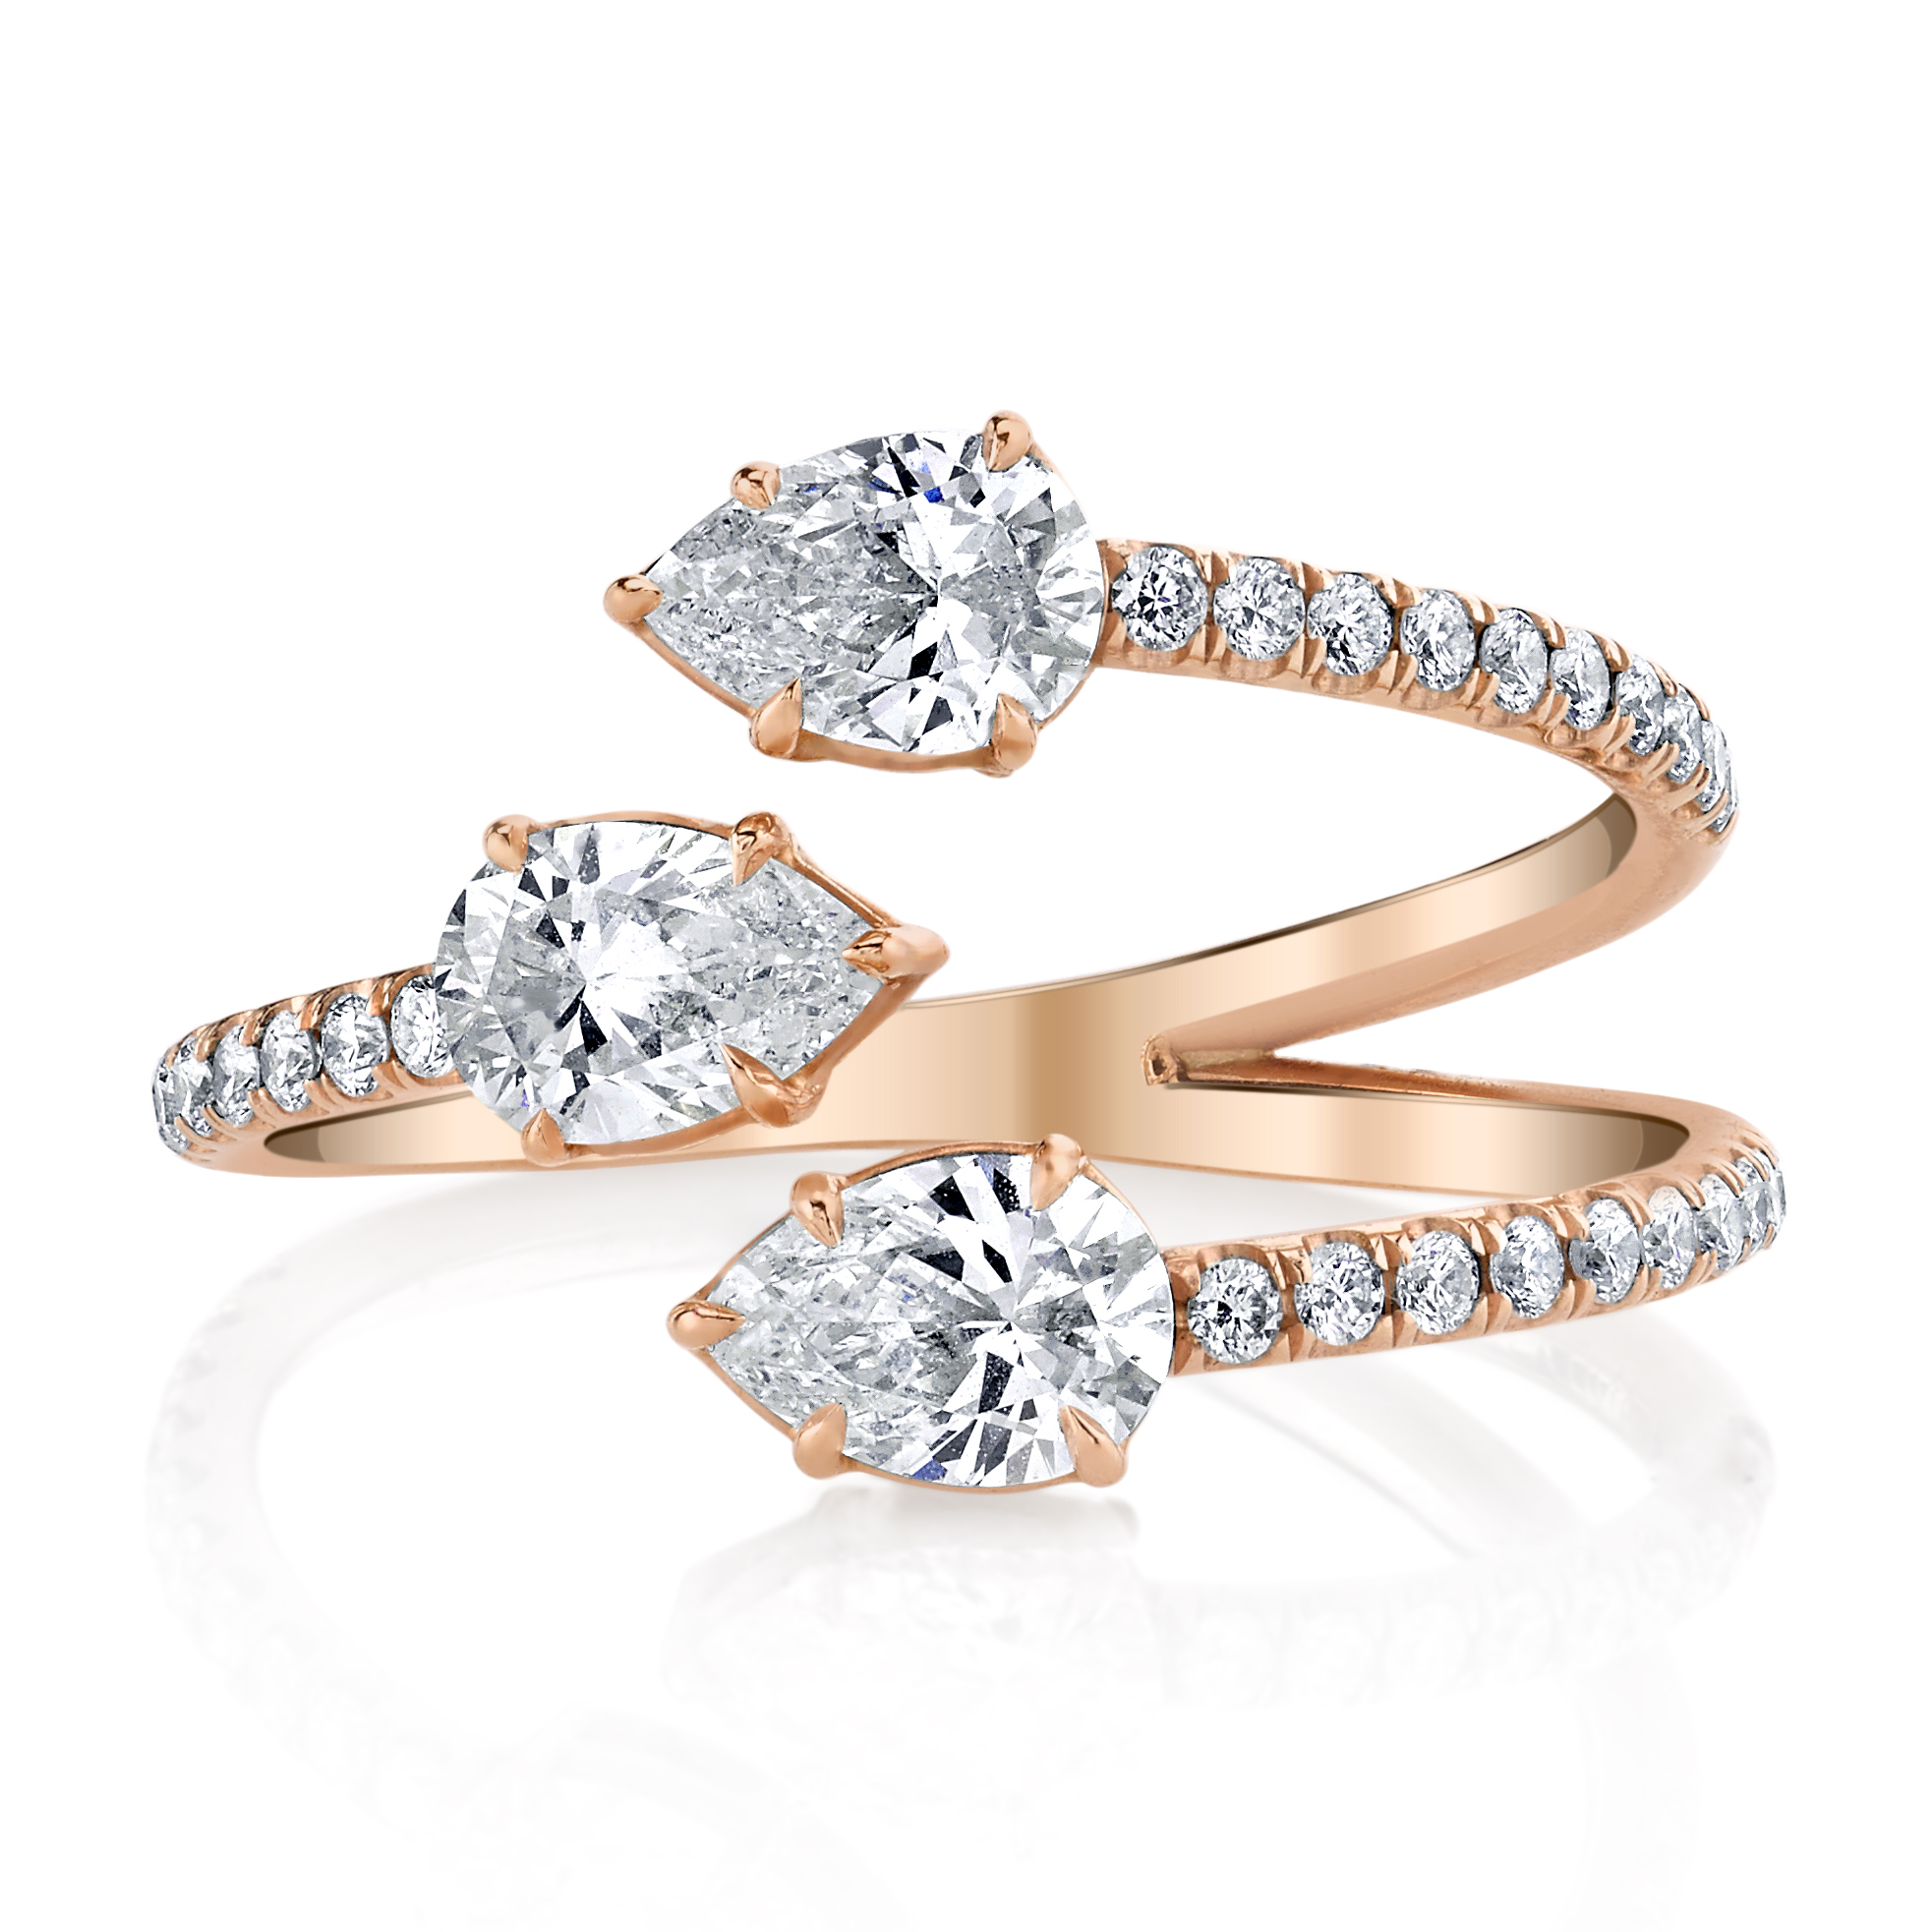 anita-ko-3-stone-claw-ring-engagement-alternative